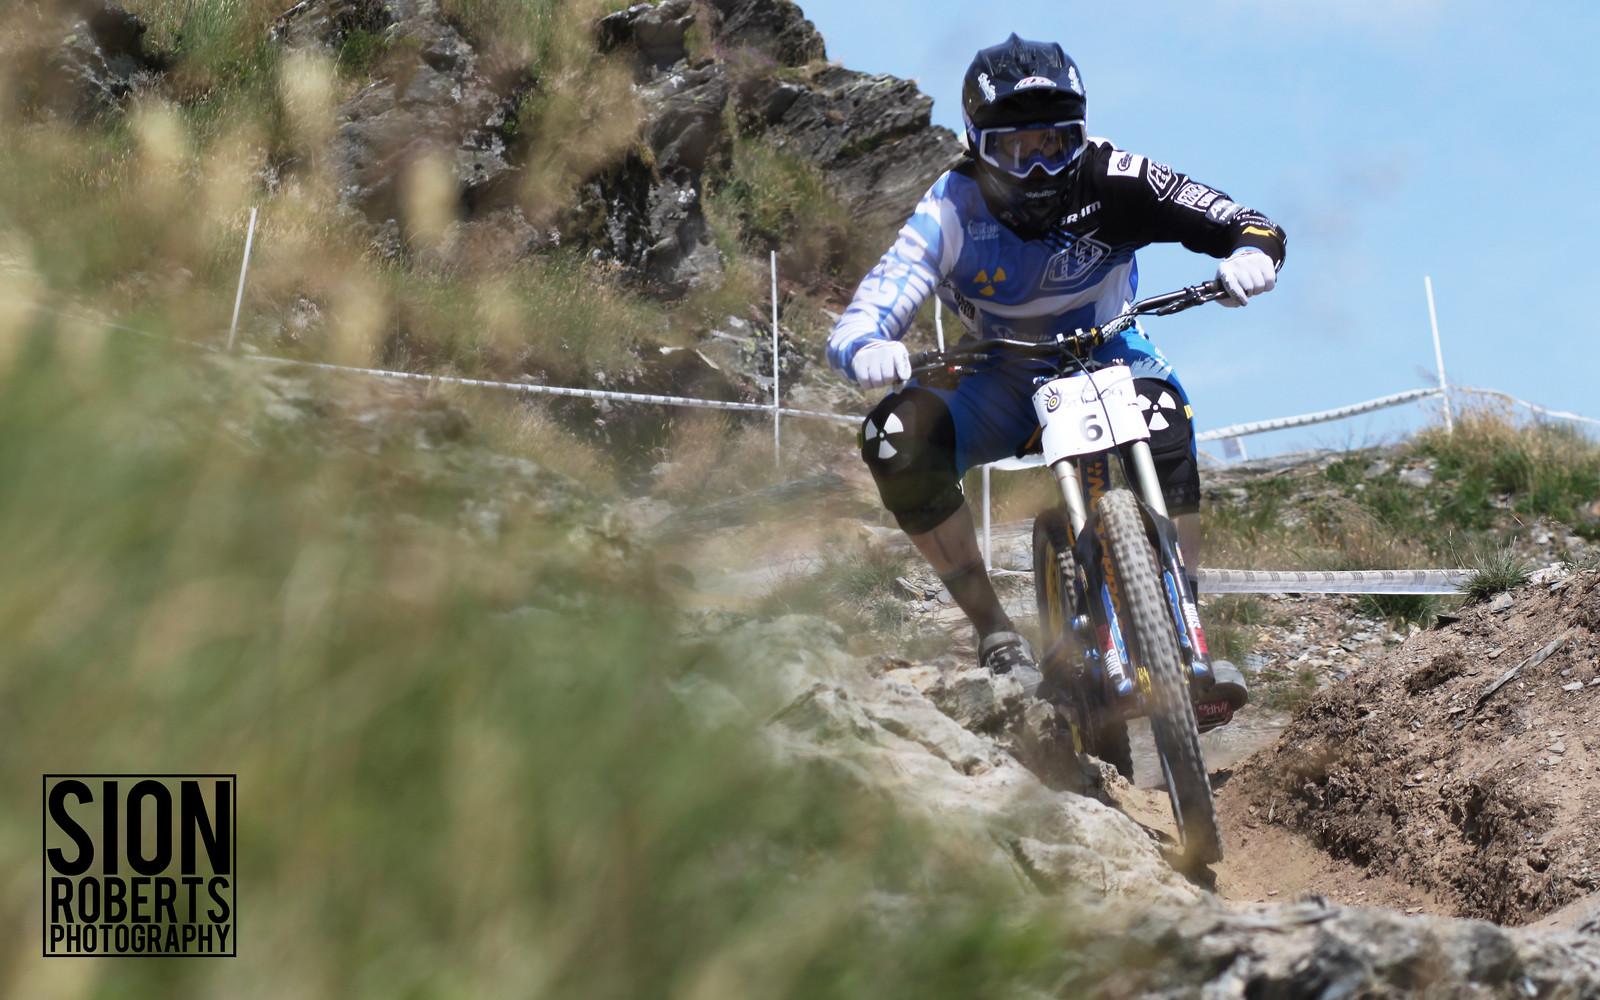 Matt Simmonds - sionr644 - Mountain Biking Pictures - Vital MTB